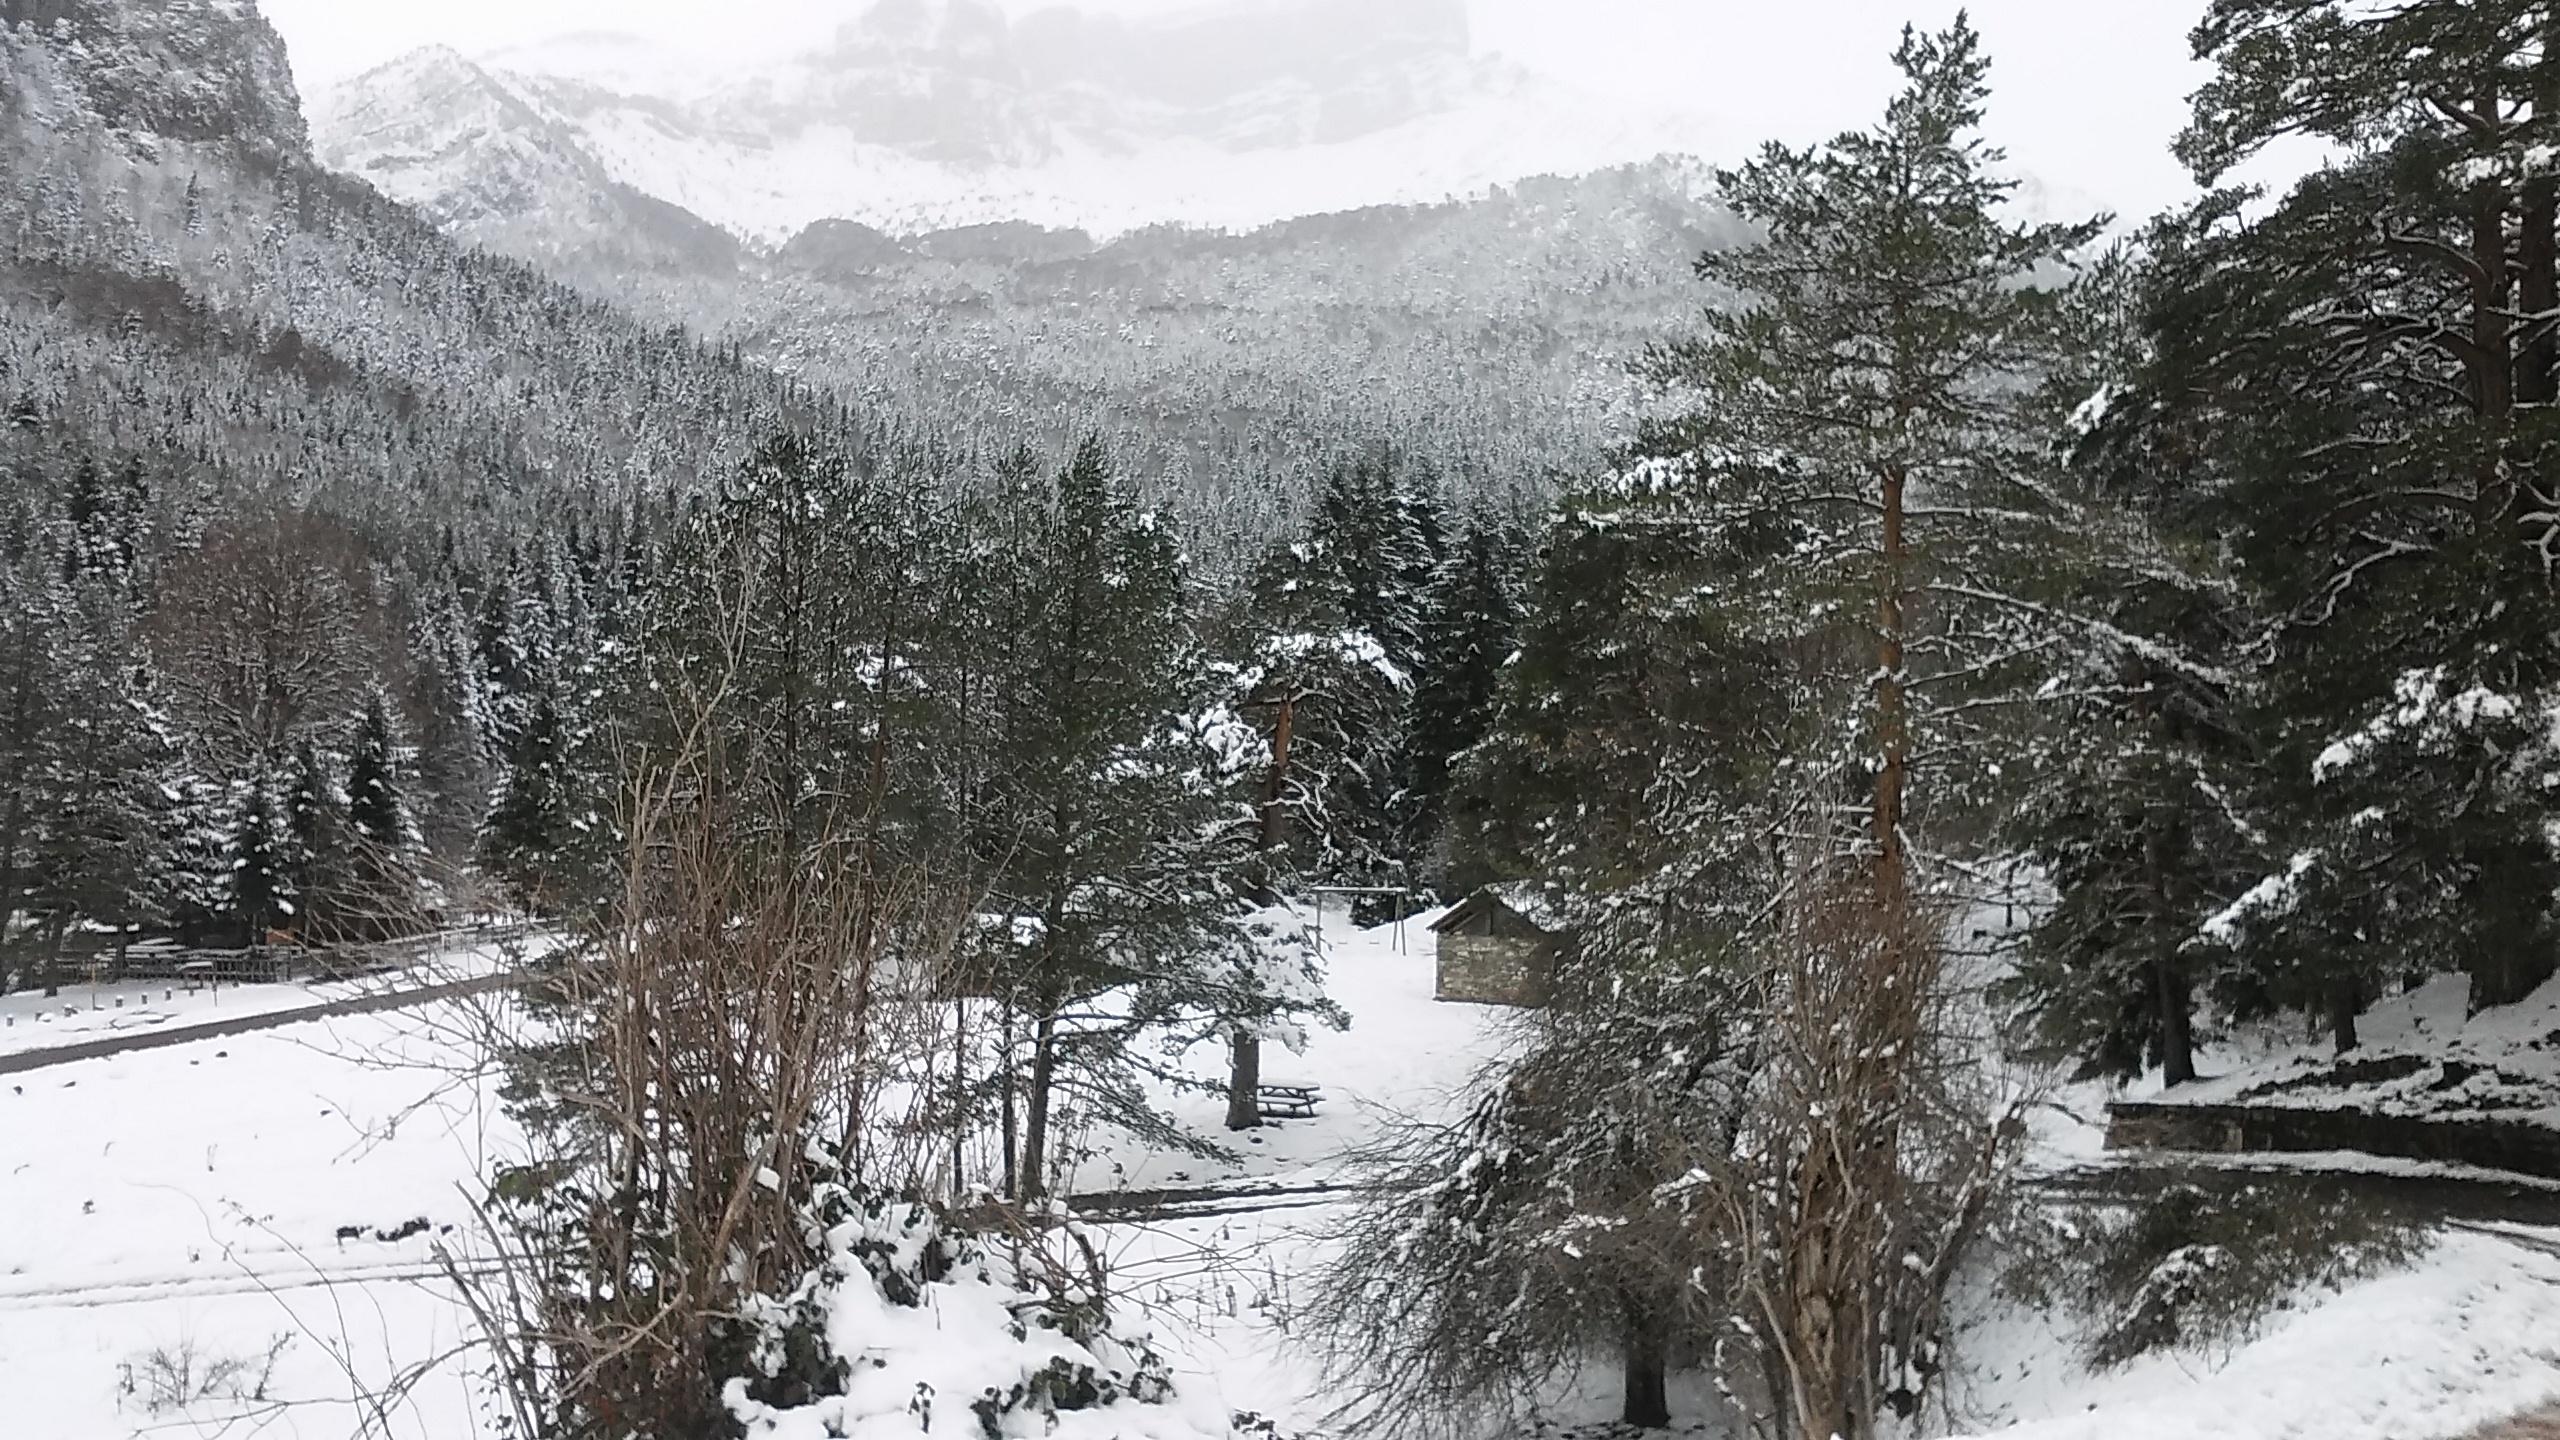 File Nieve En La Selva De Oza Huesca Panoramio Jpg Wikimedia Commons